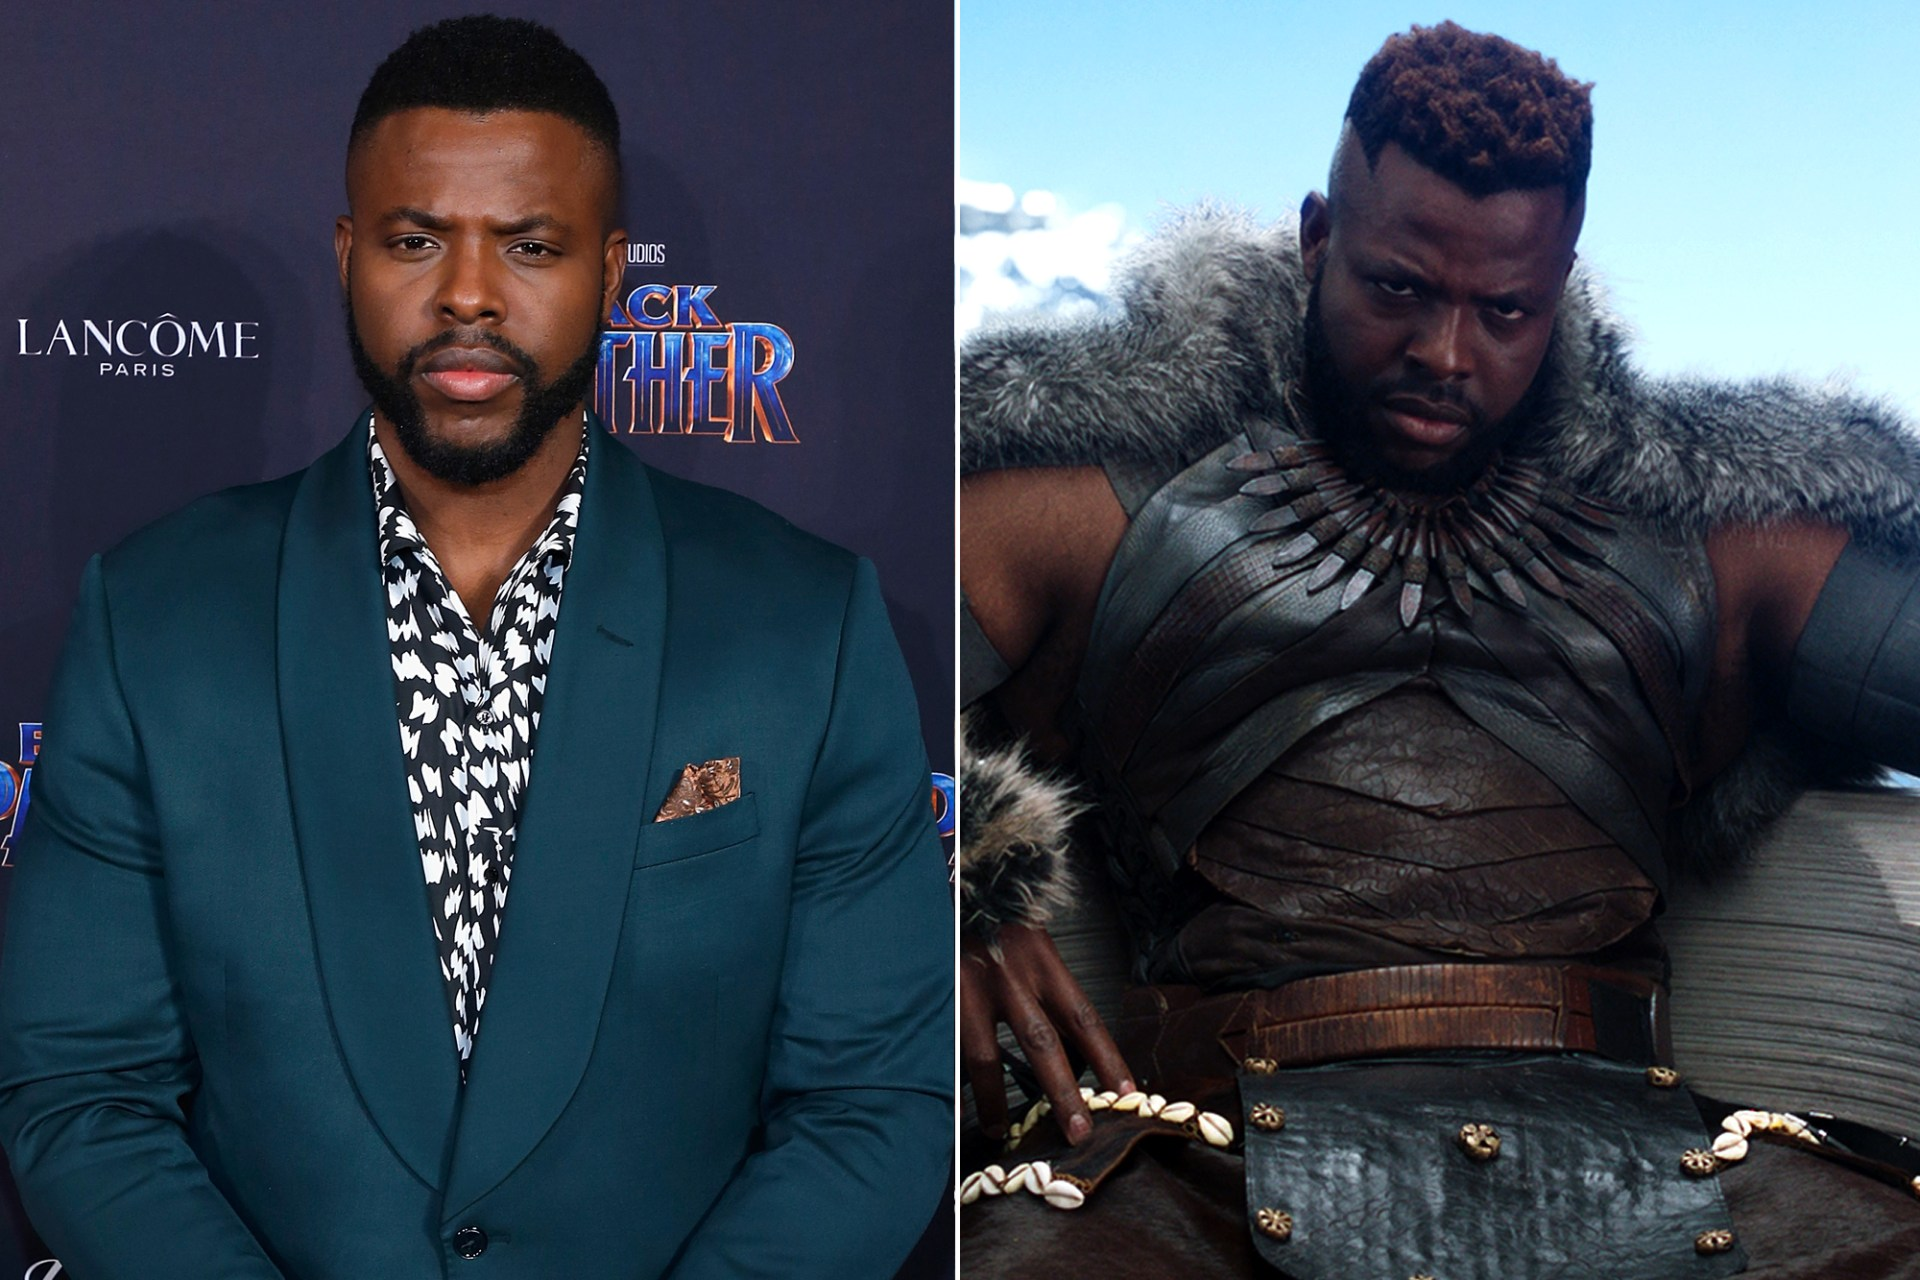 UFC: Black Panther star Winston Duke Reportedly Set To Play Kimbo Slice In Biopic - Duke